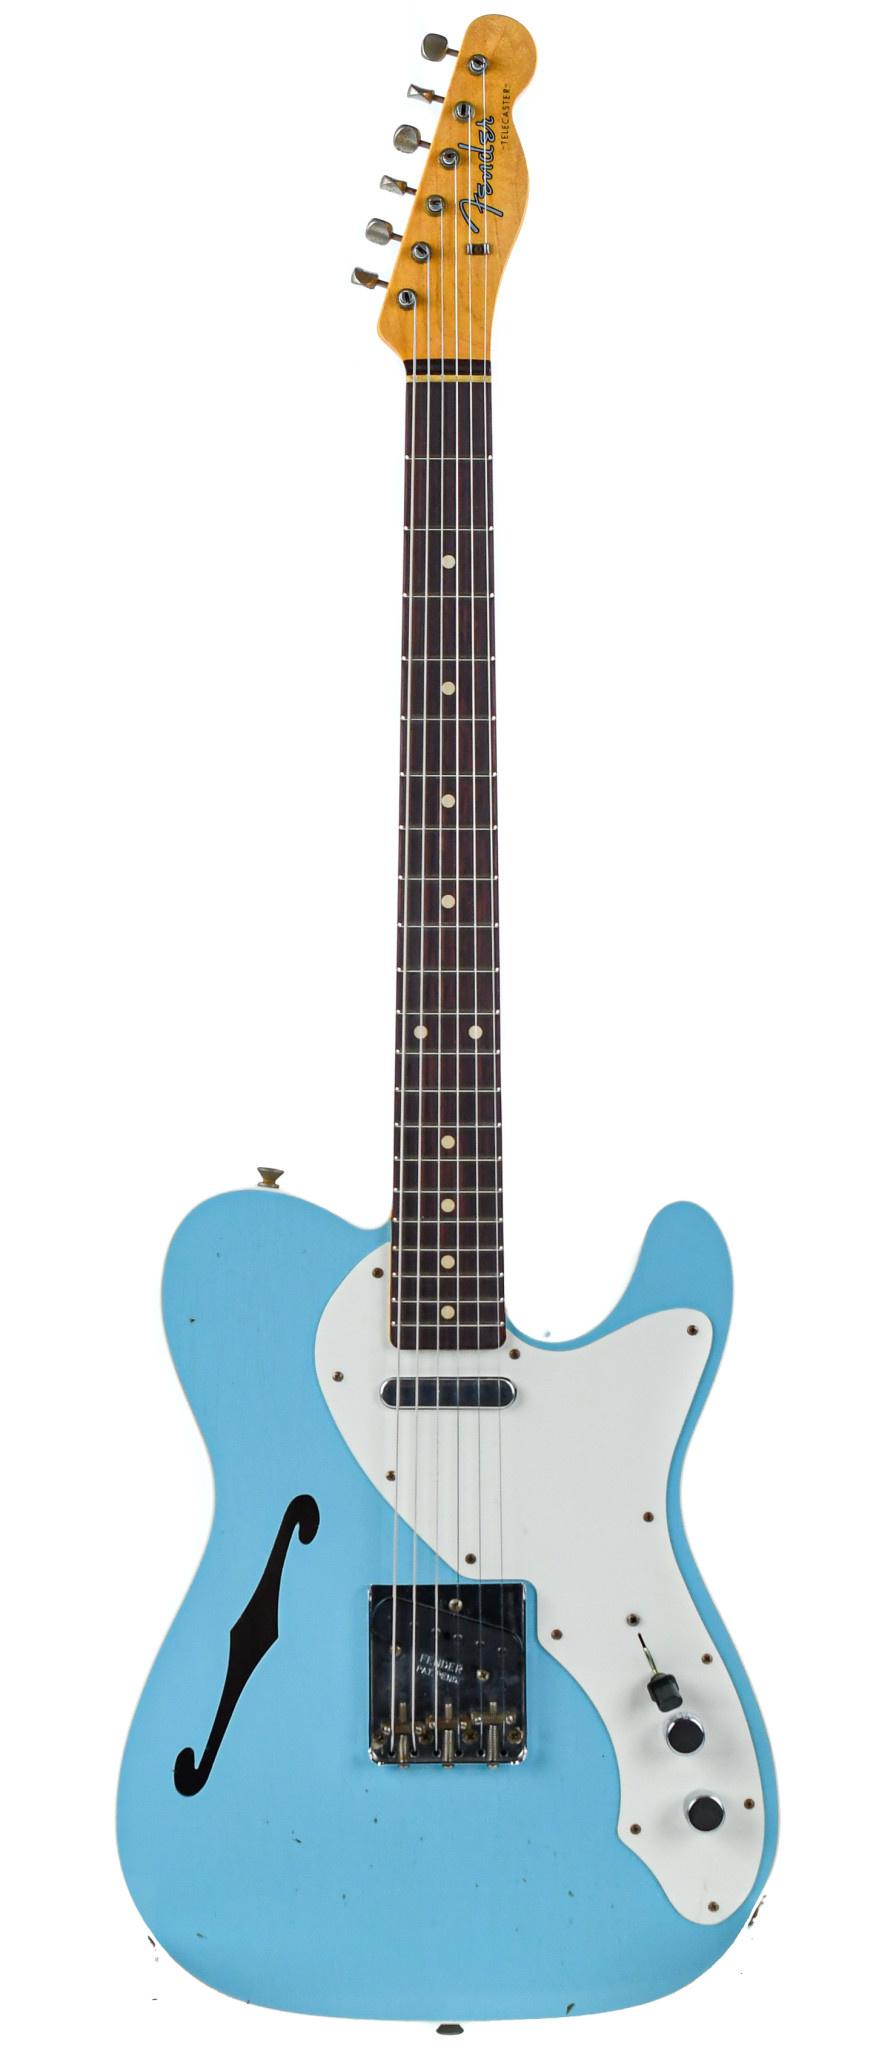 Fender Custom 60 Telecaster Thinline Journeyman Daphne Blue